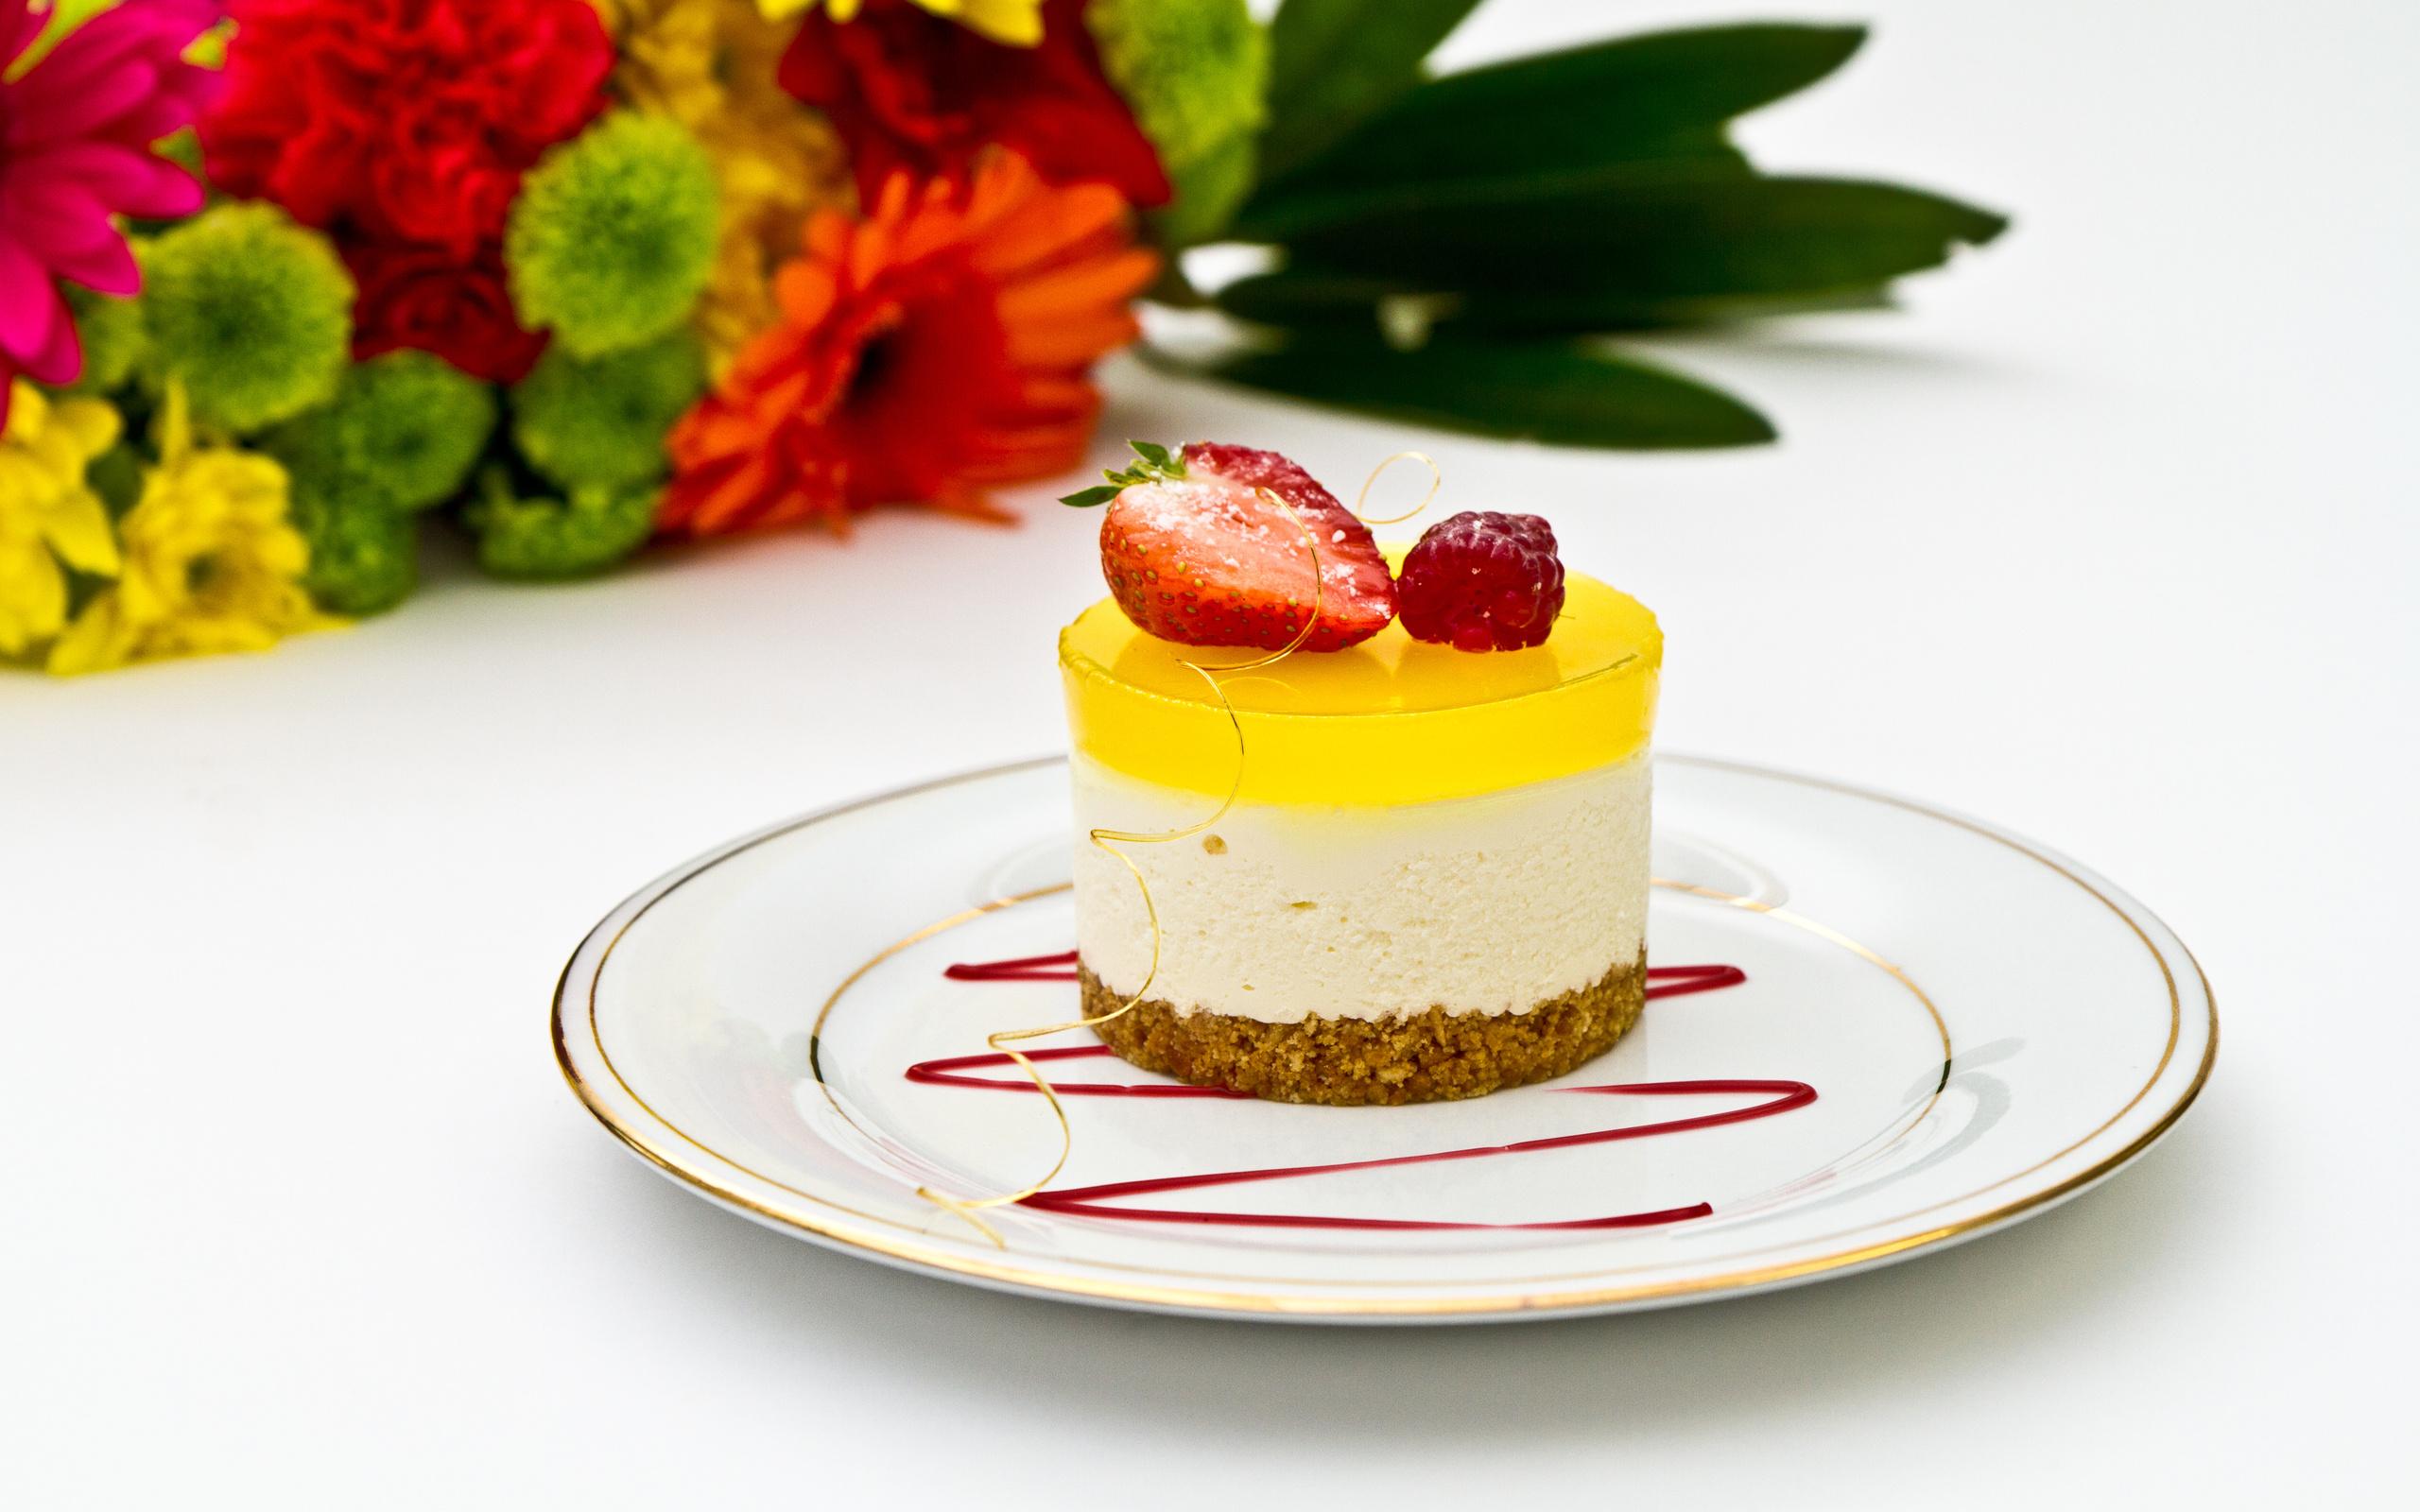 sweet strawberry dessert berries food wallpaper